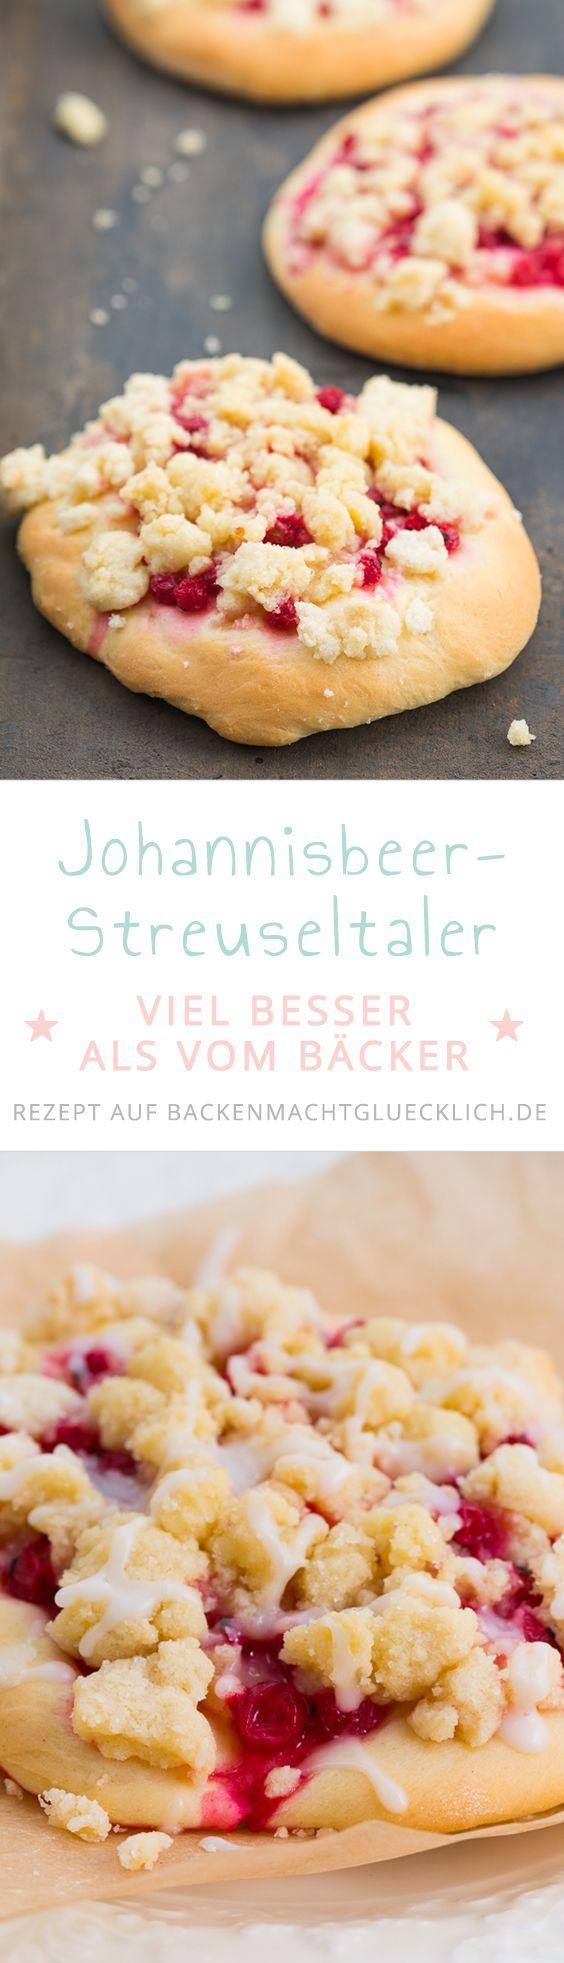 Streuseltaler-Rezept. Hefeteig, Butterstreusel, Johannisbeeren: Diese einfachen Streuseltaler schmecken wie vom Bäcker! (Baking Bread)